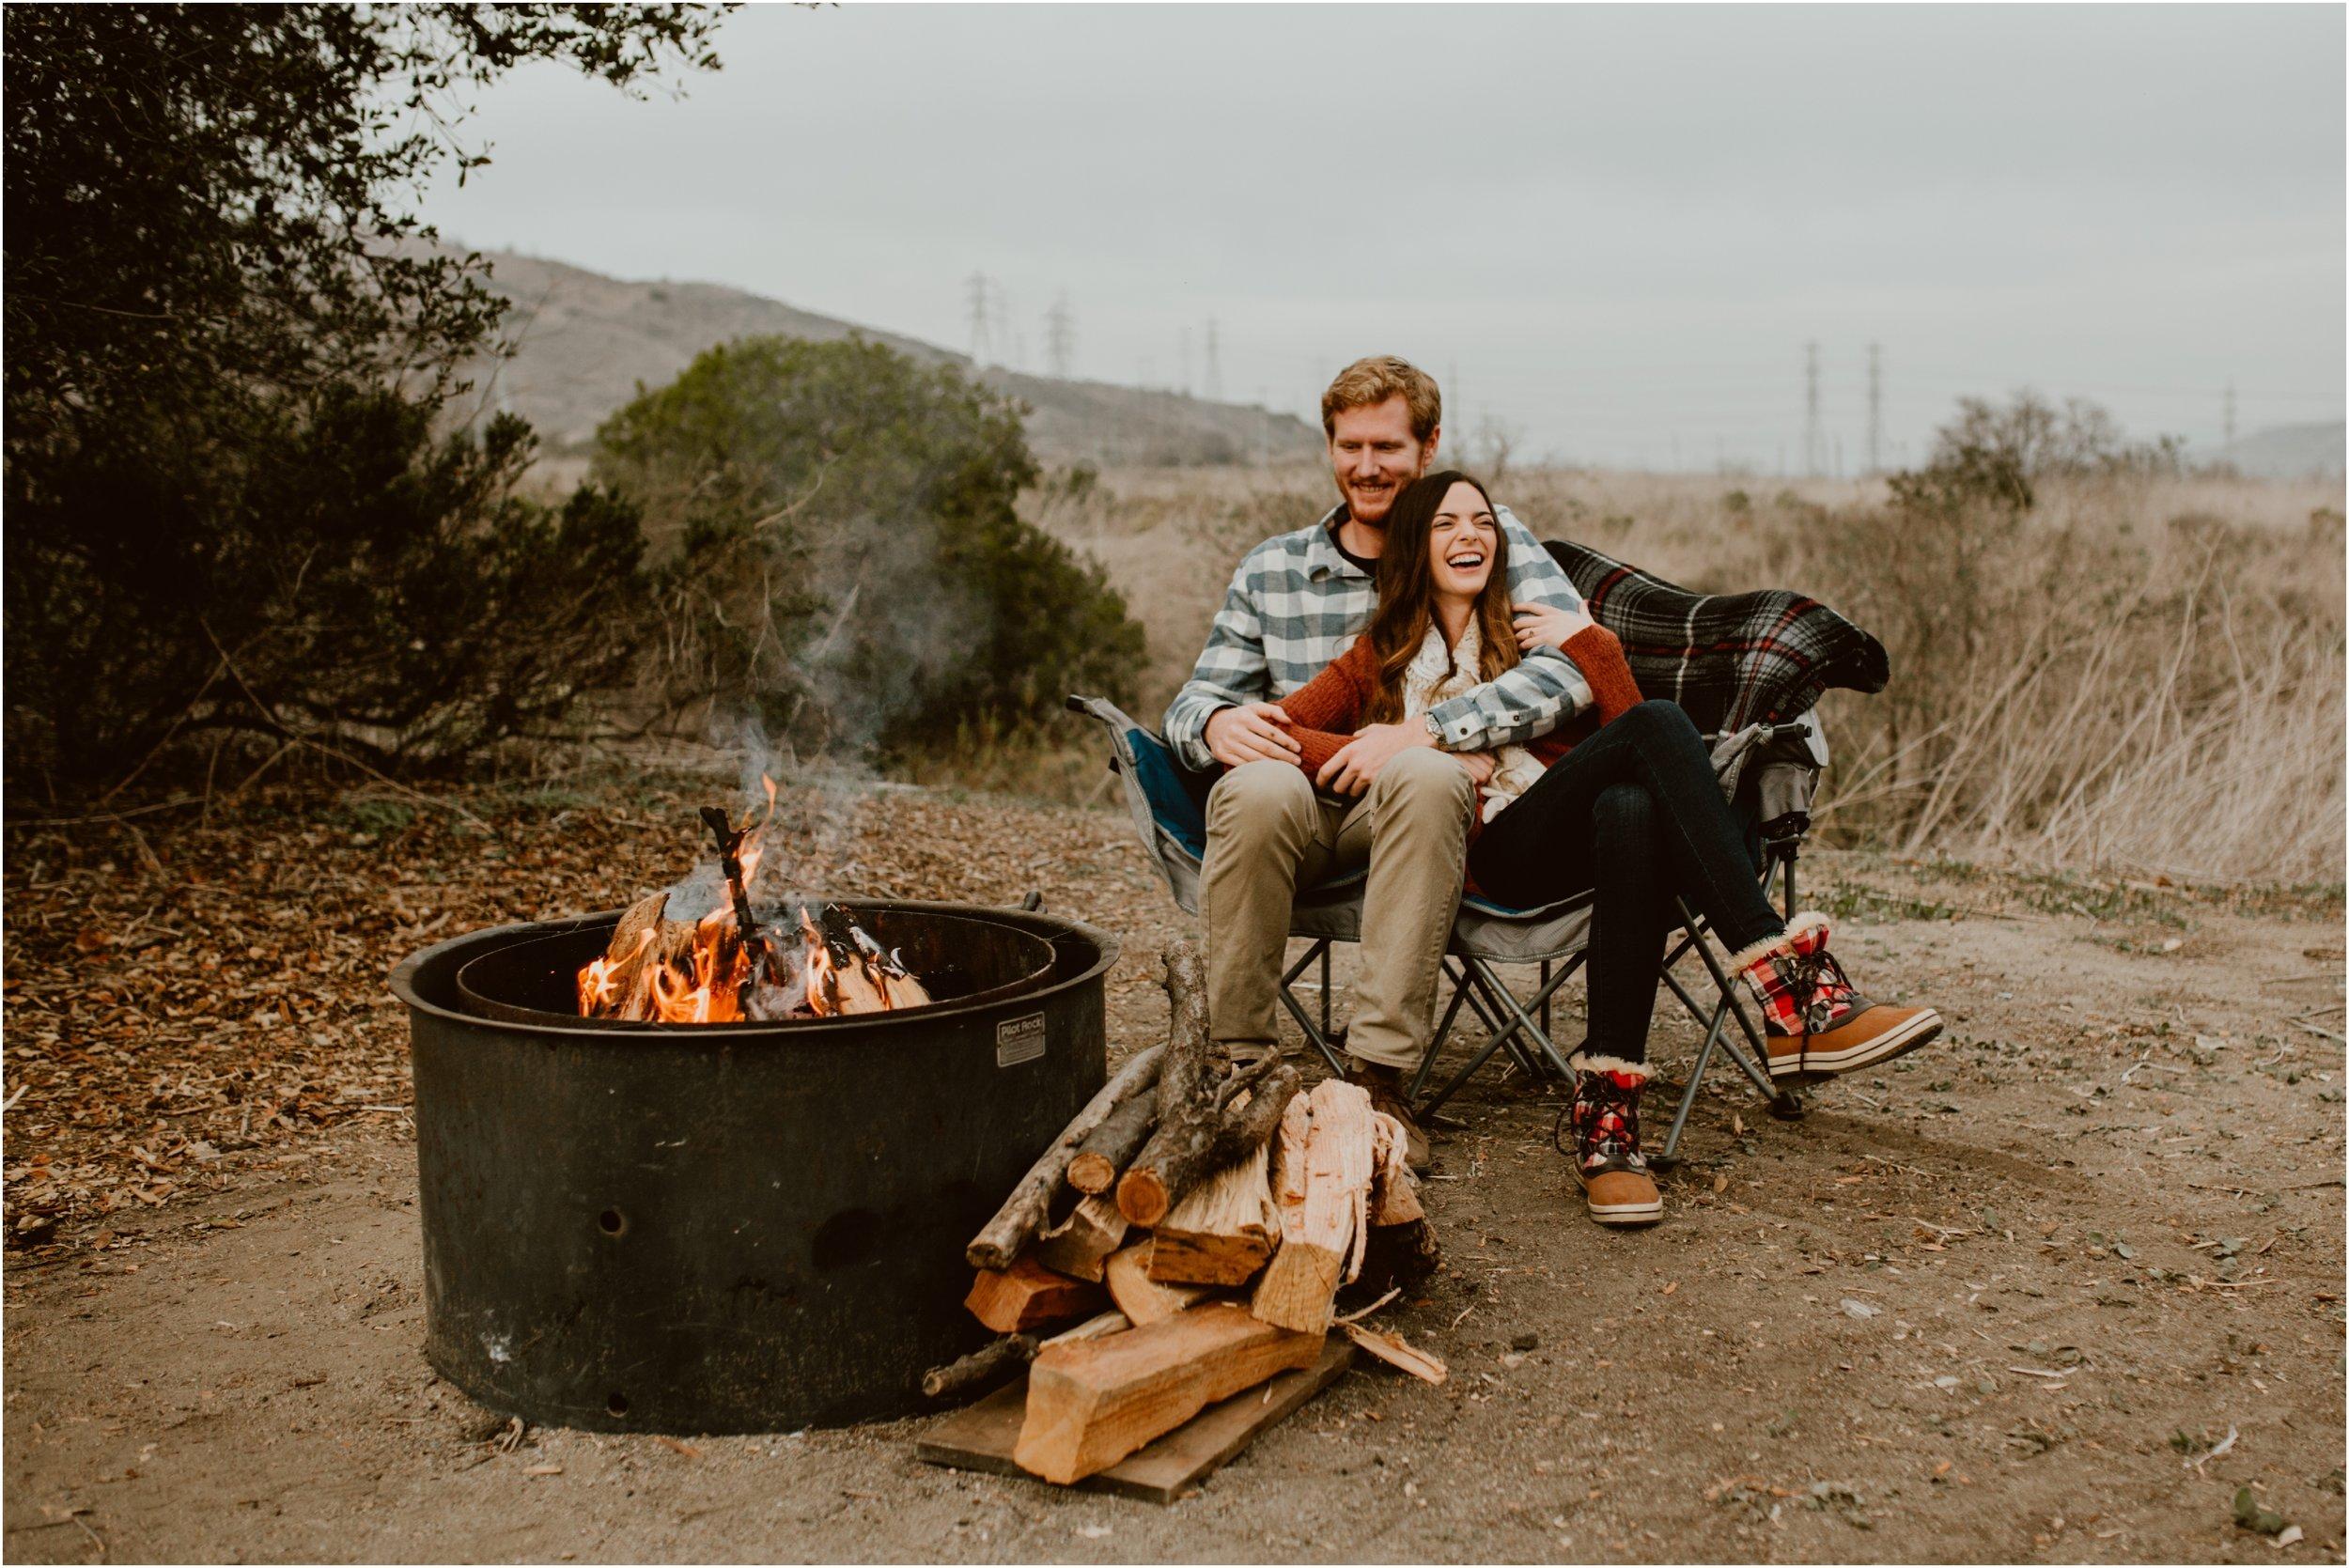 San-Clemente-Engagement-C+P-Diana-Lake-Photography-19.jpg